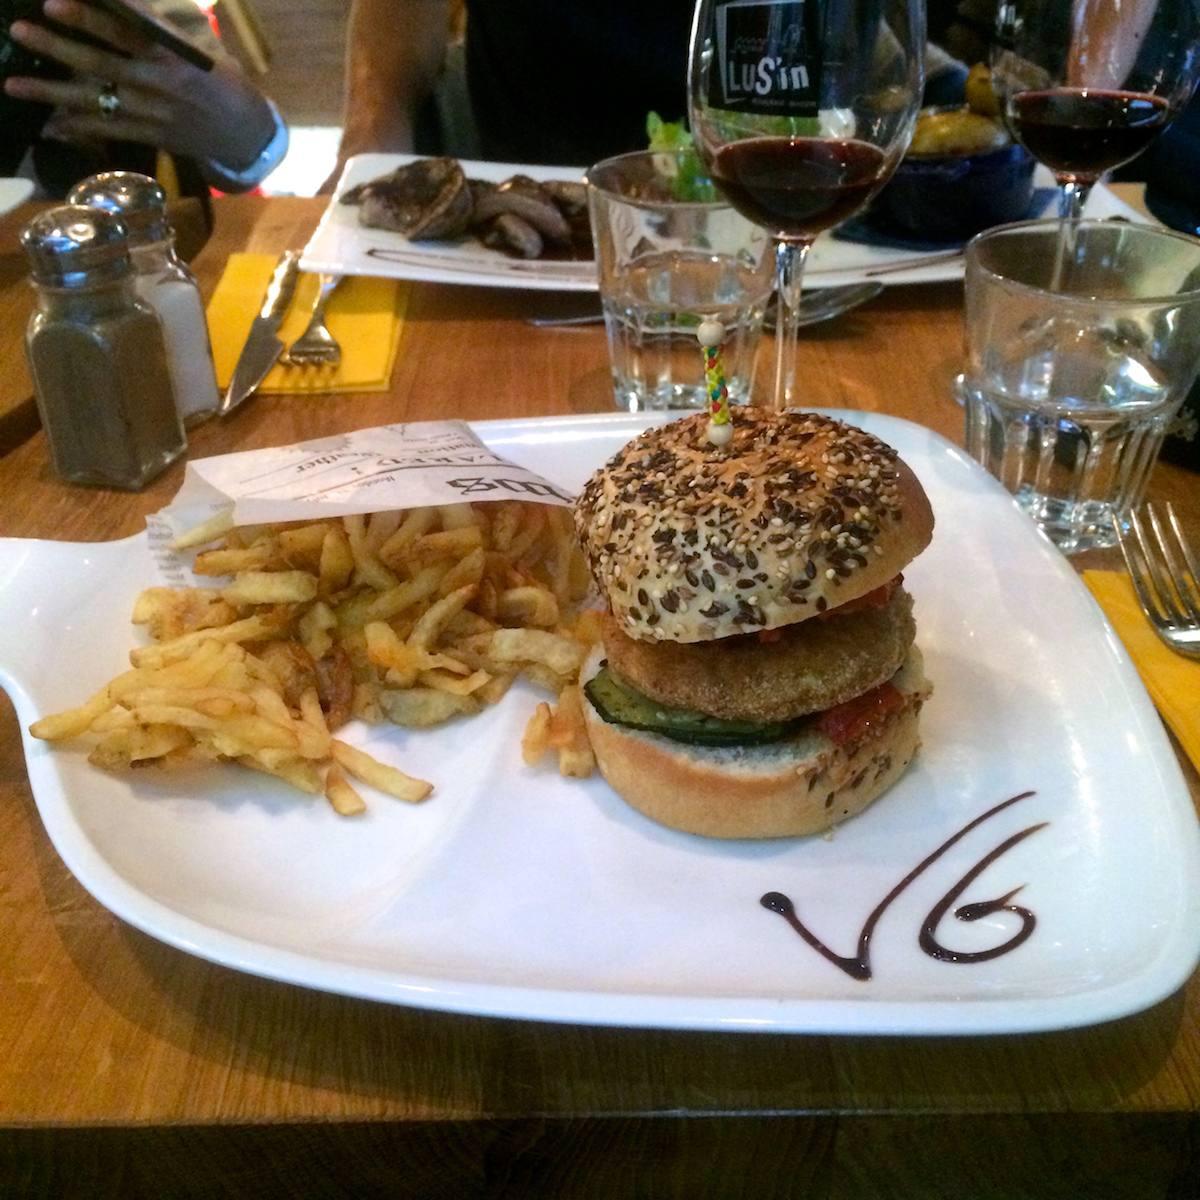 3 - Lusin - Meilleur burger nantes